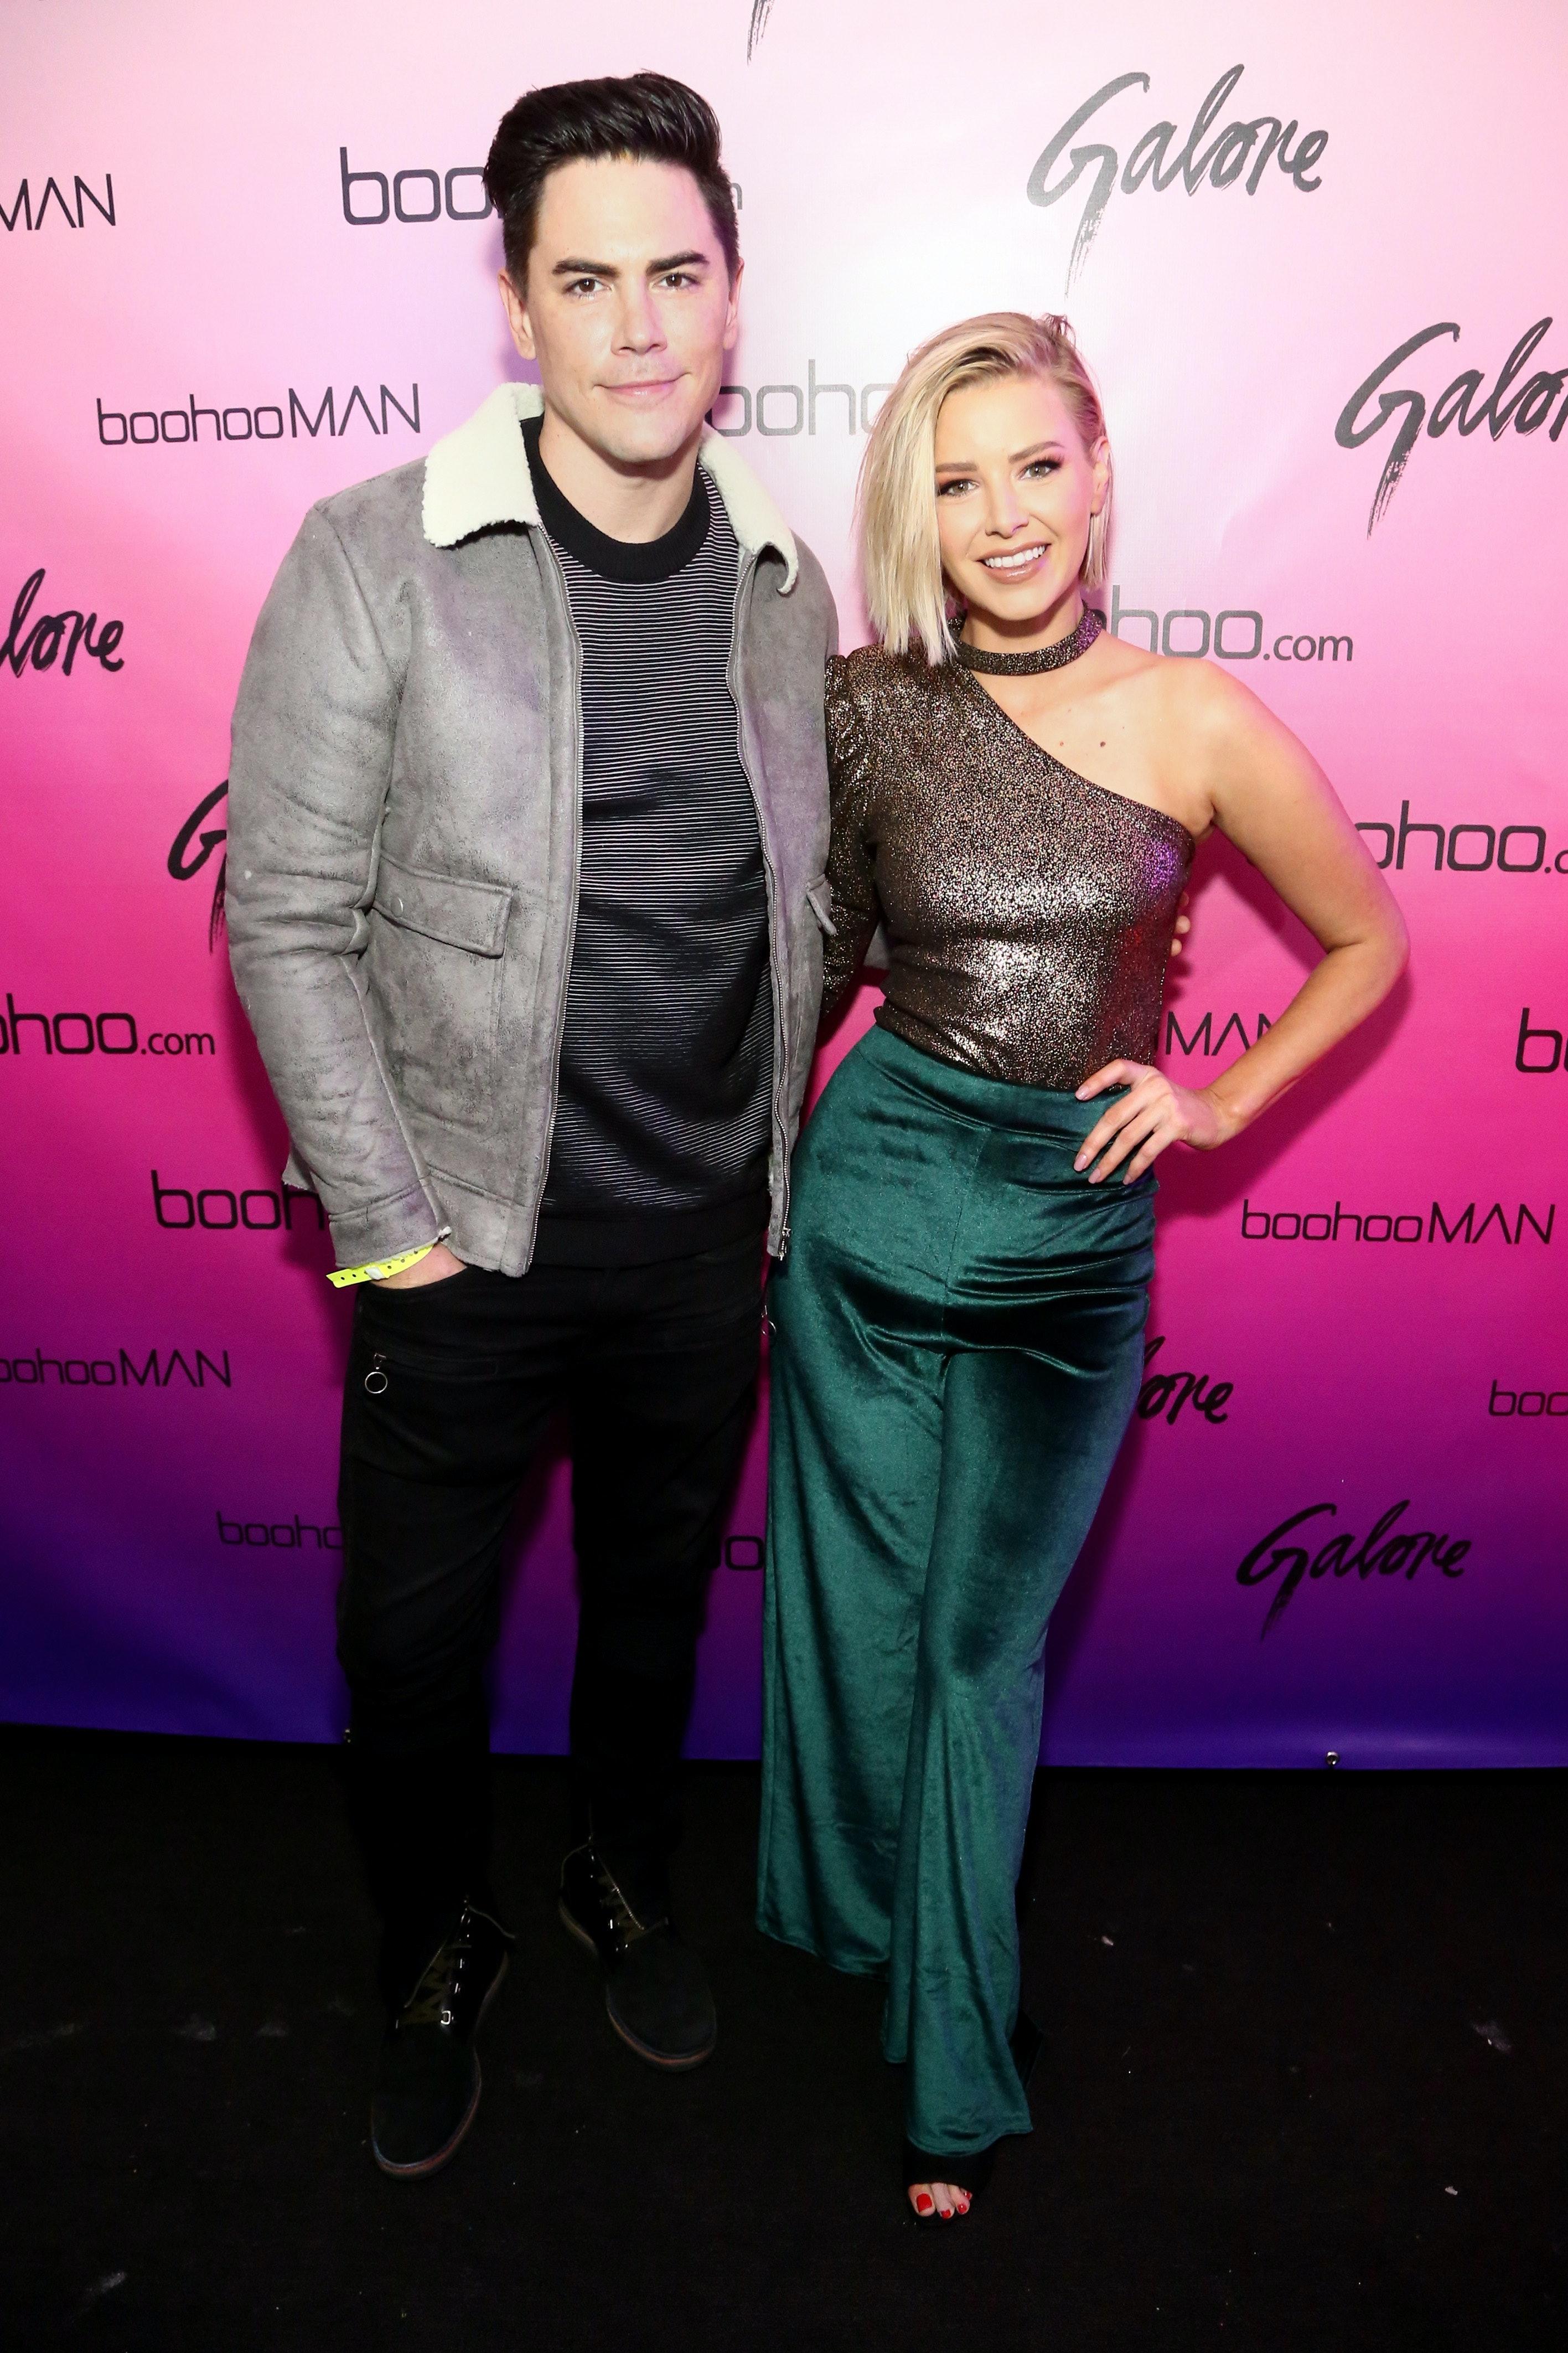 Ariana tom dating vanderpump reunion